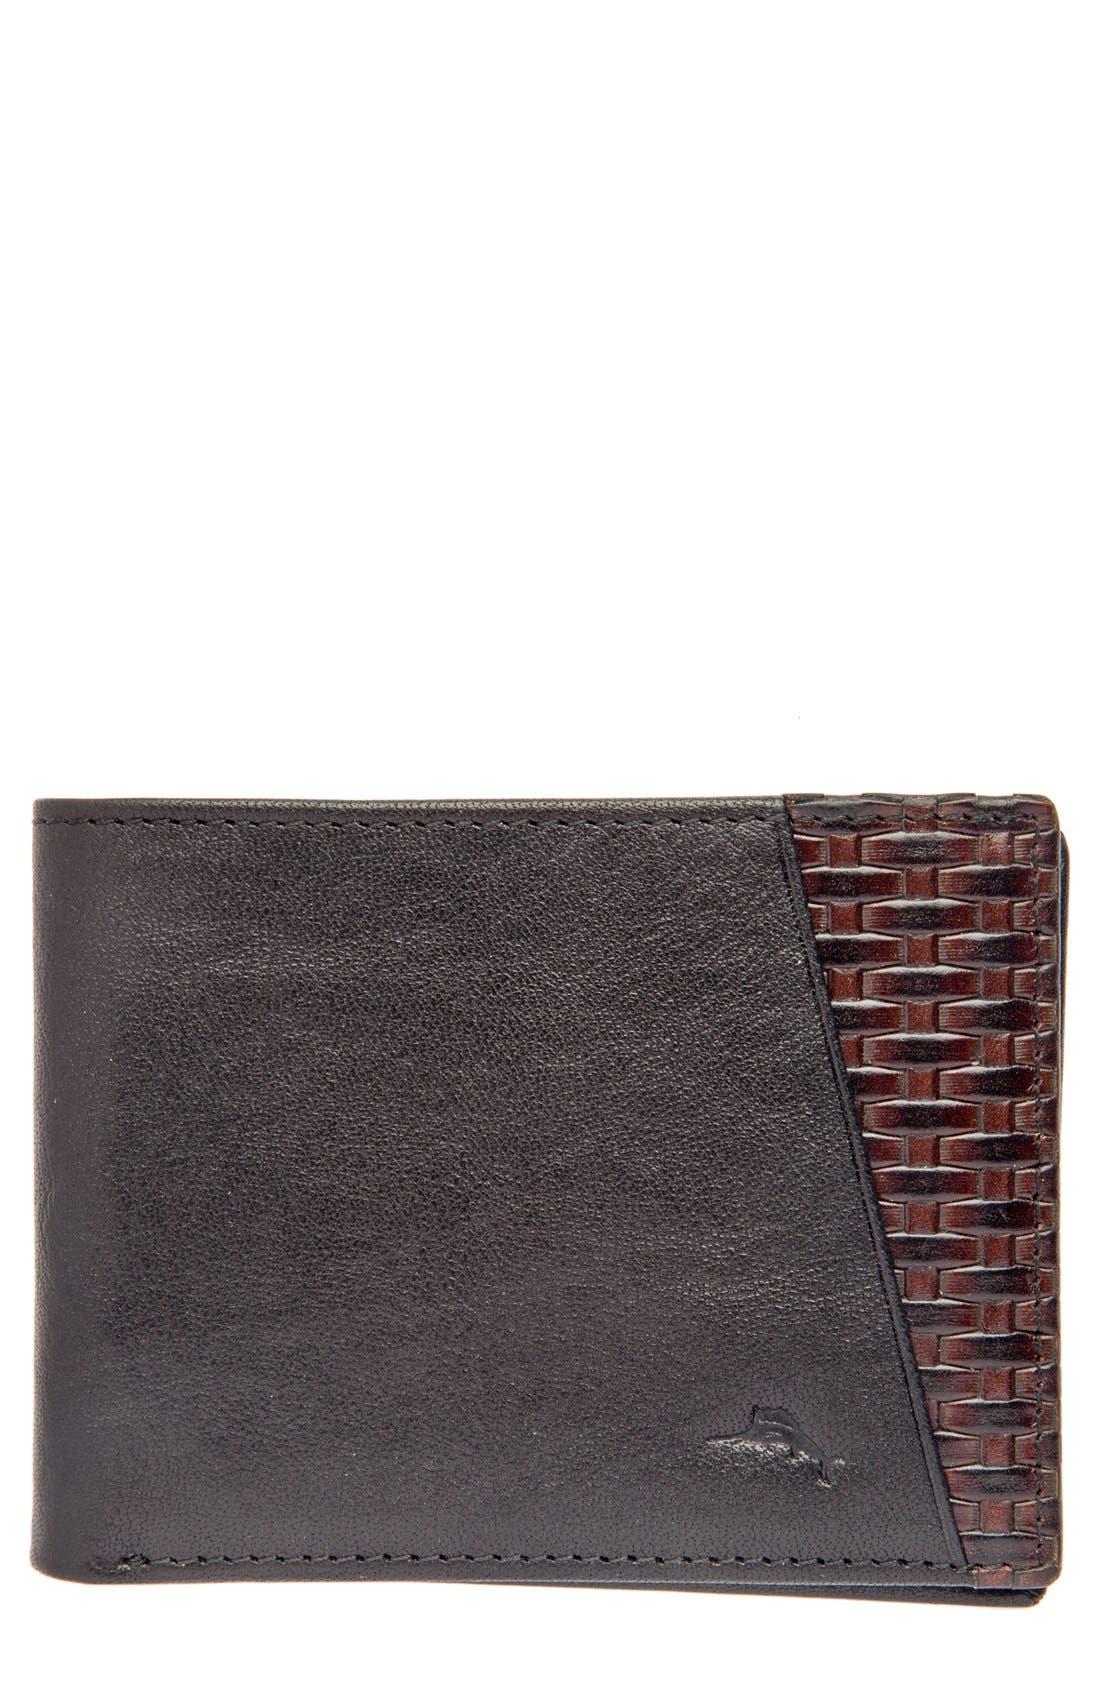 Main Image - Tommy Bahama 'Basketweave' Leather Wallet